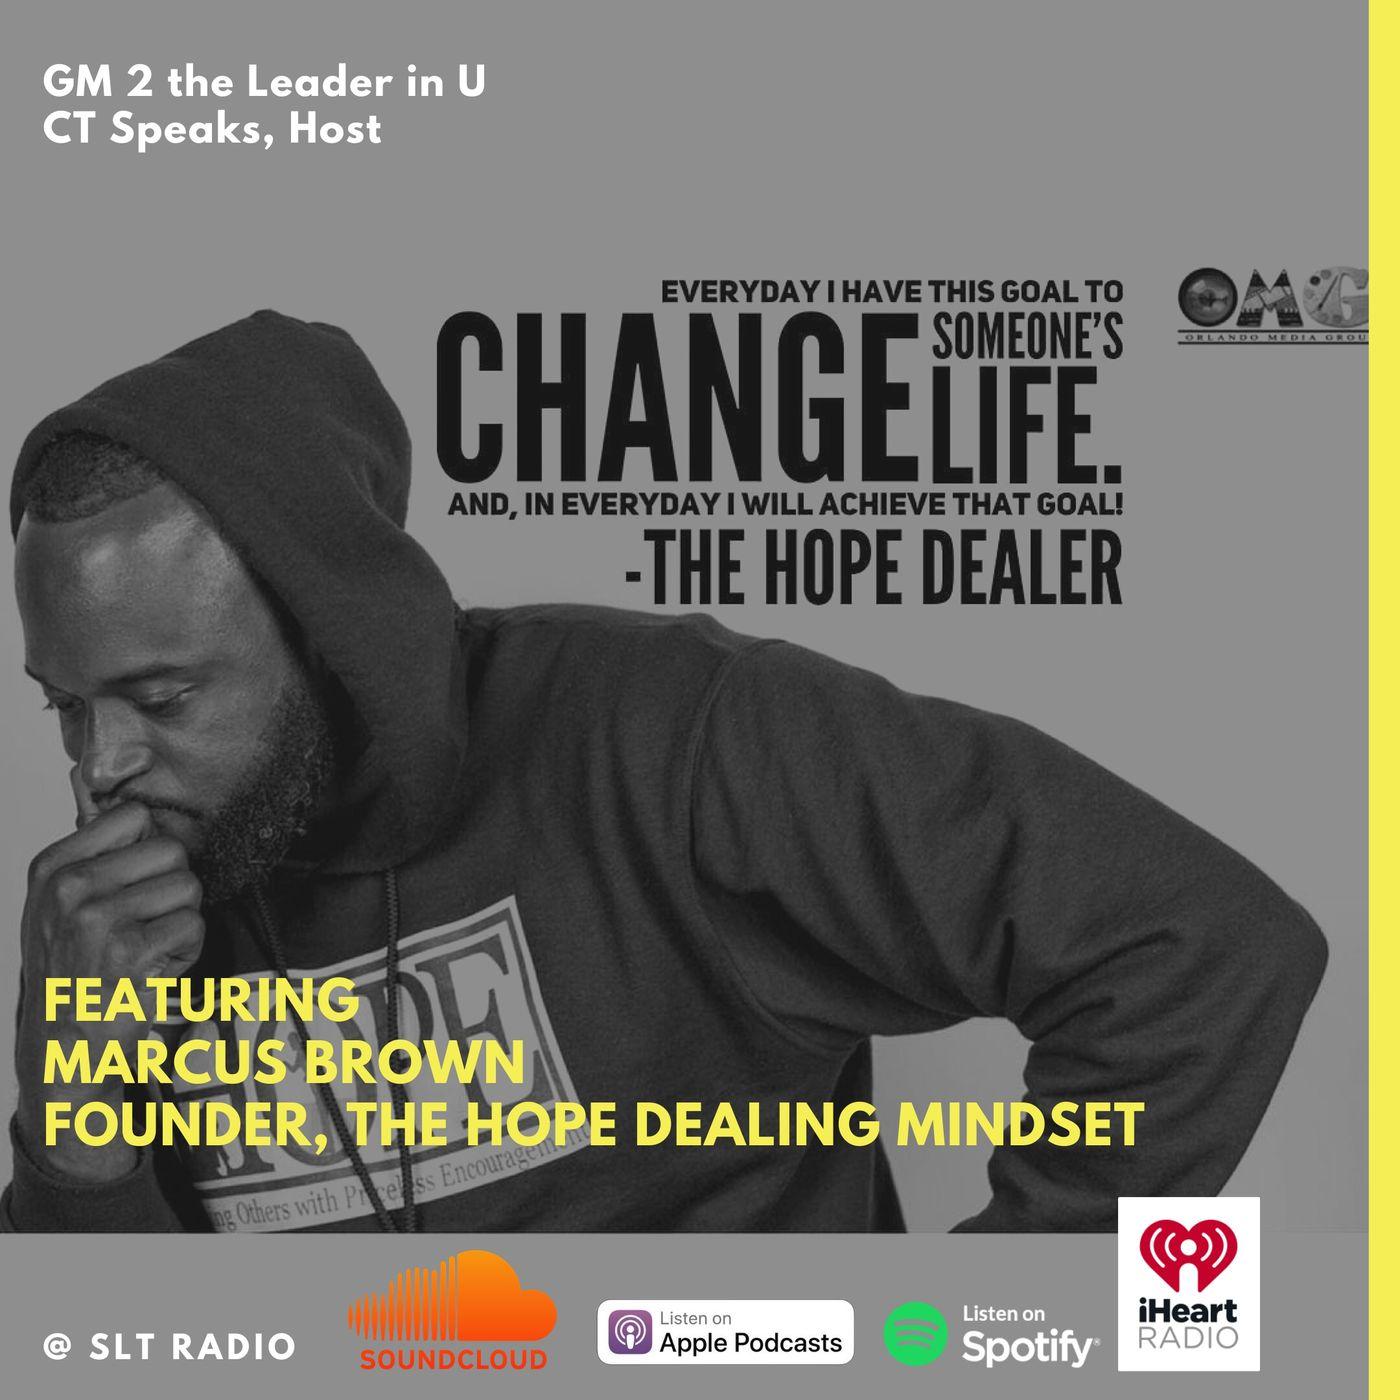 5.4 - GM2Leader - Marcus Brown, Founder of The HOPE Dealing Mindset - CT Speaks (Host)